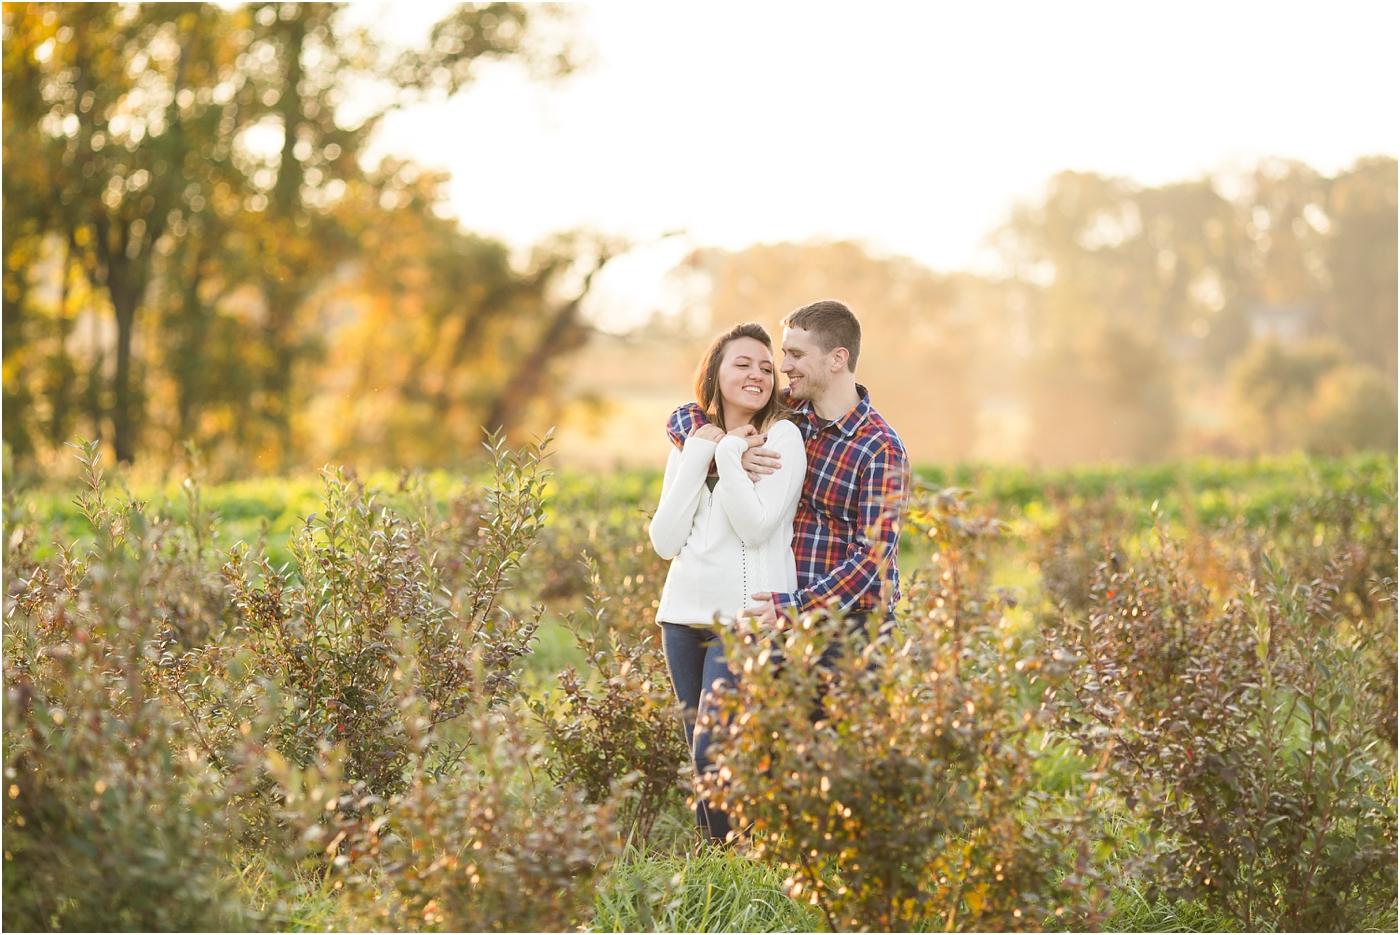 Larriland-Farm-Engagement-Photo_0018.jpg